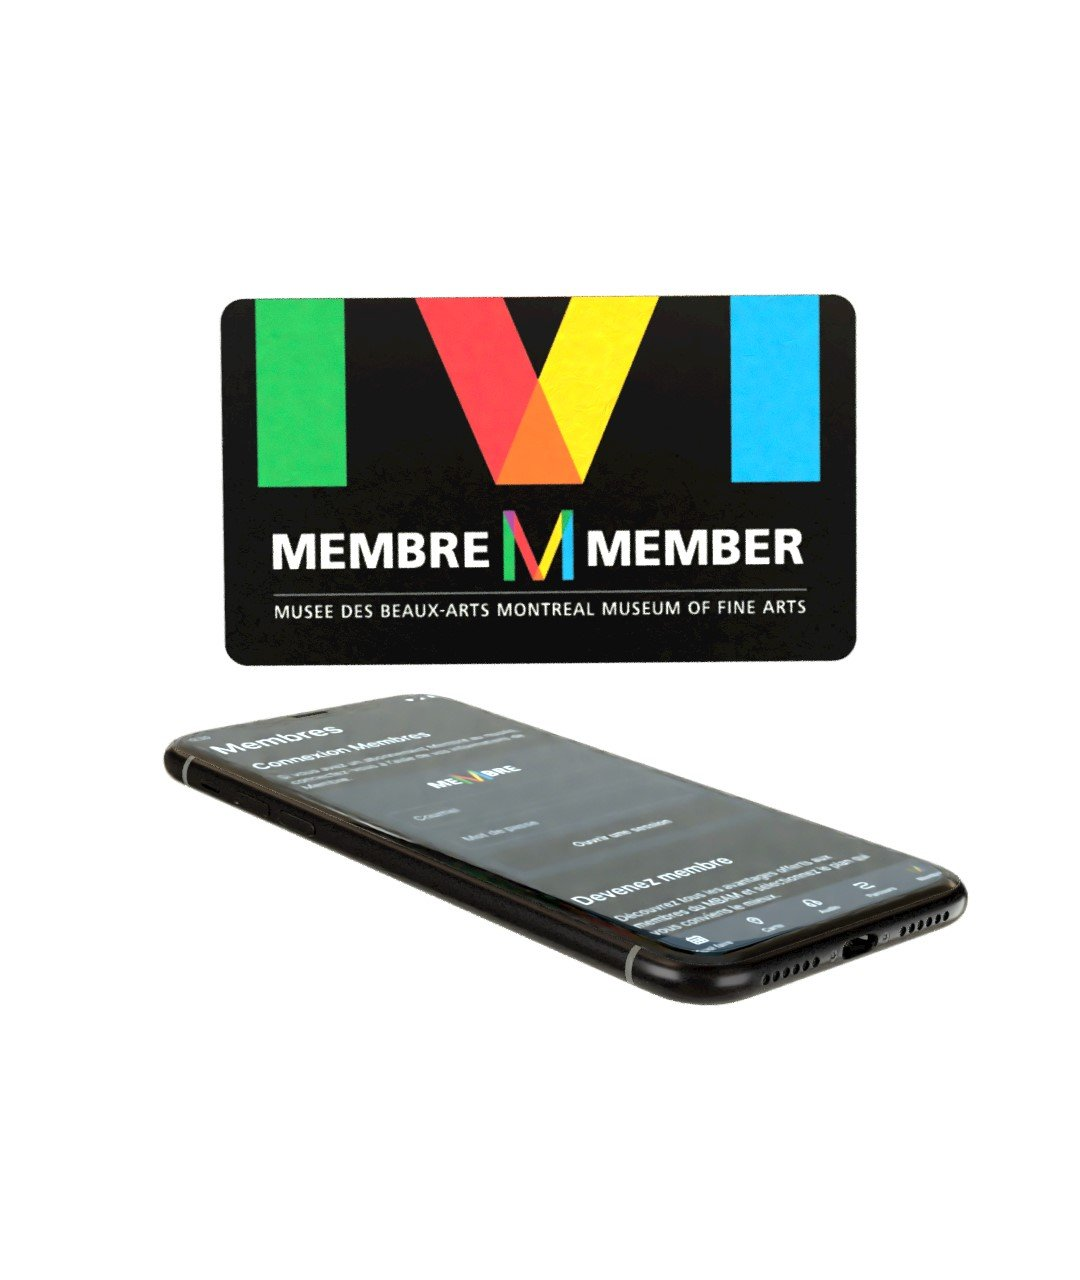 Mobile application - Member card